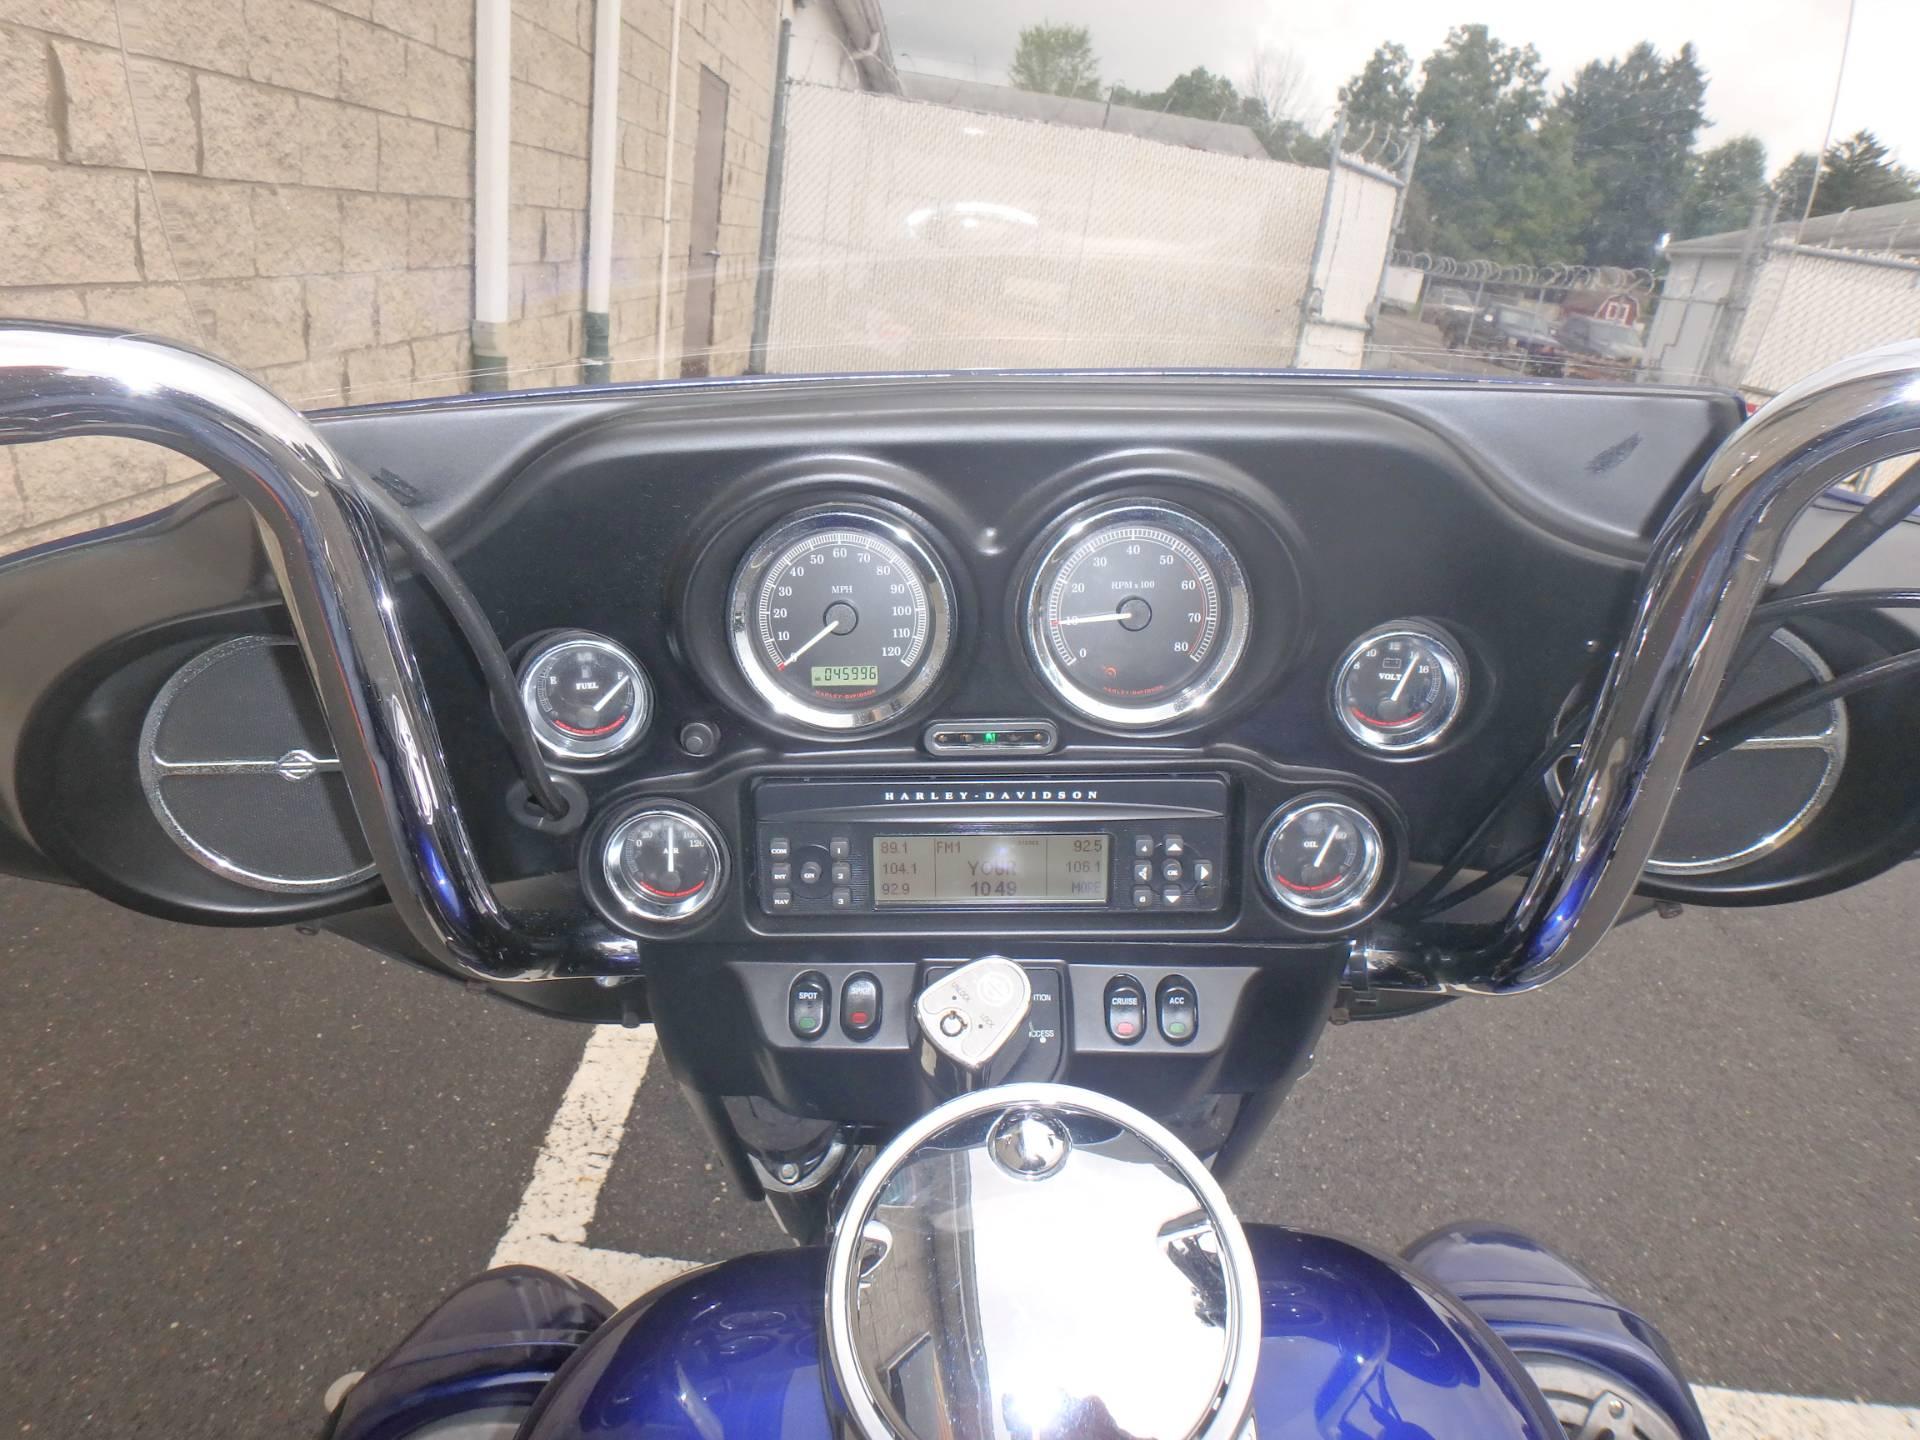 2007 Harley-Davidson Ultra Classic Electra Glide 10